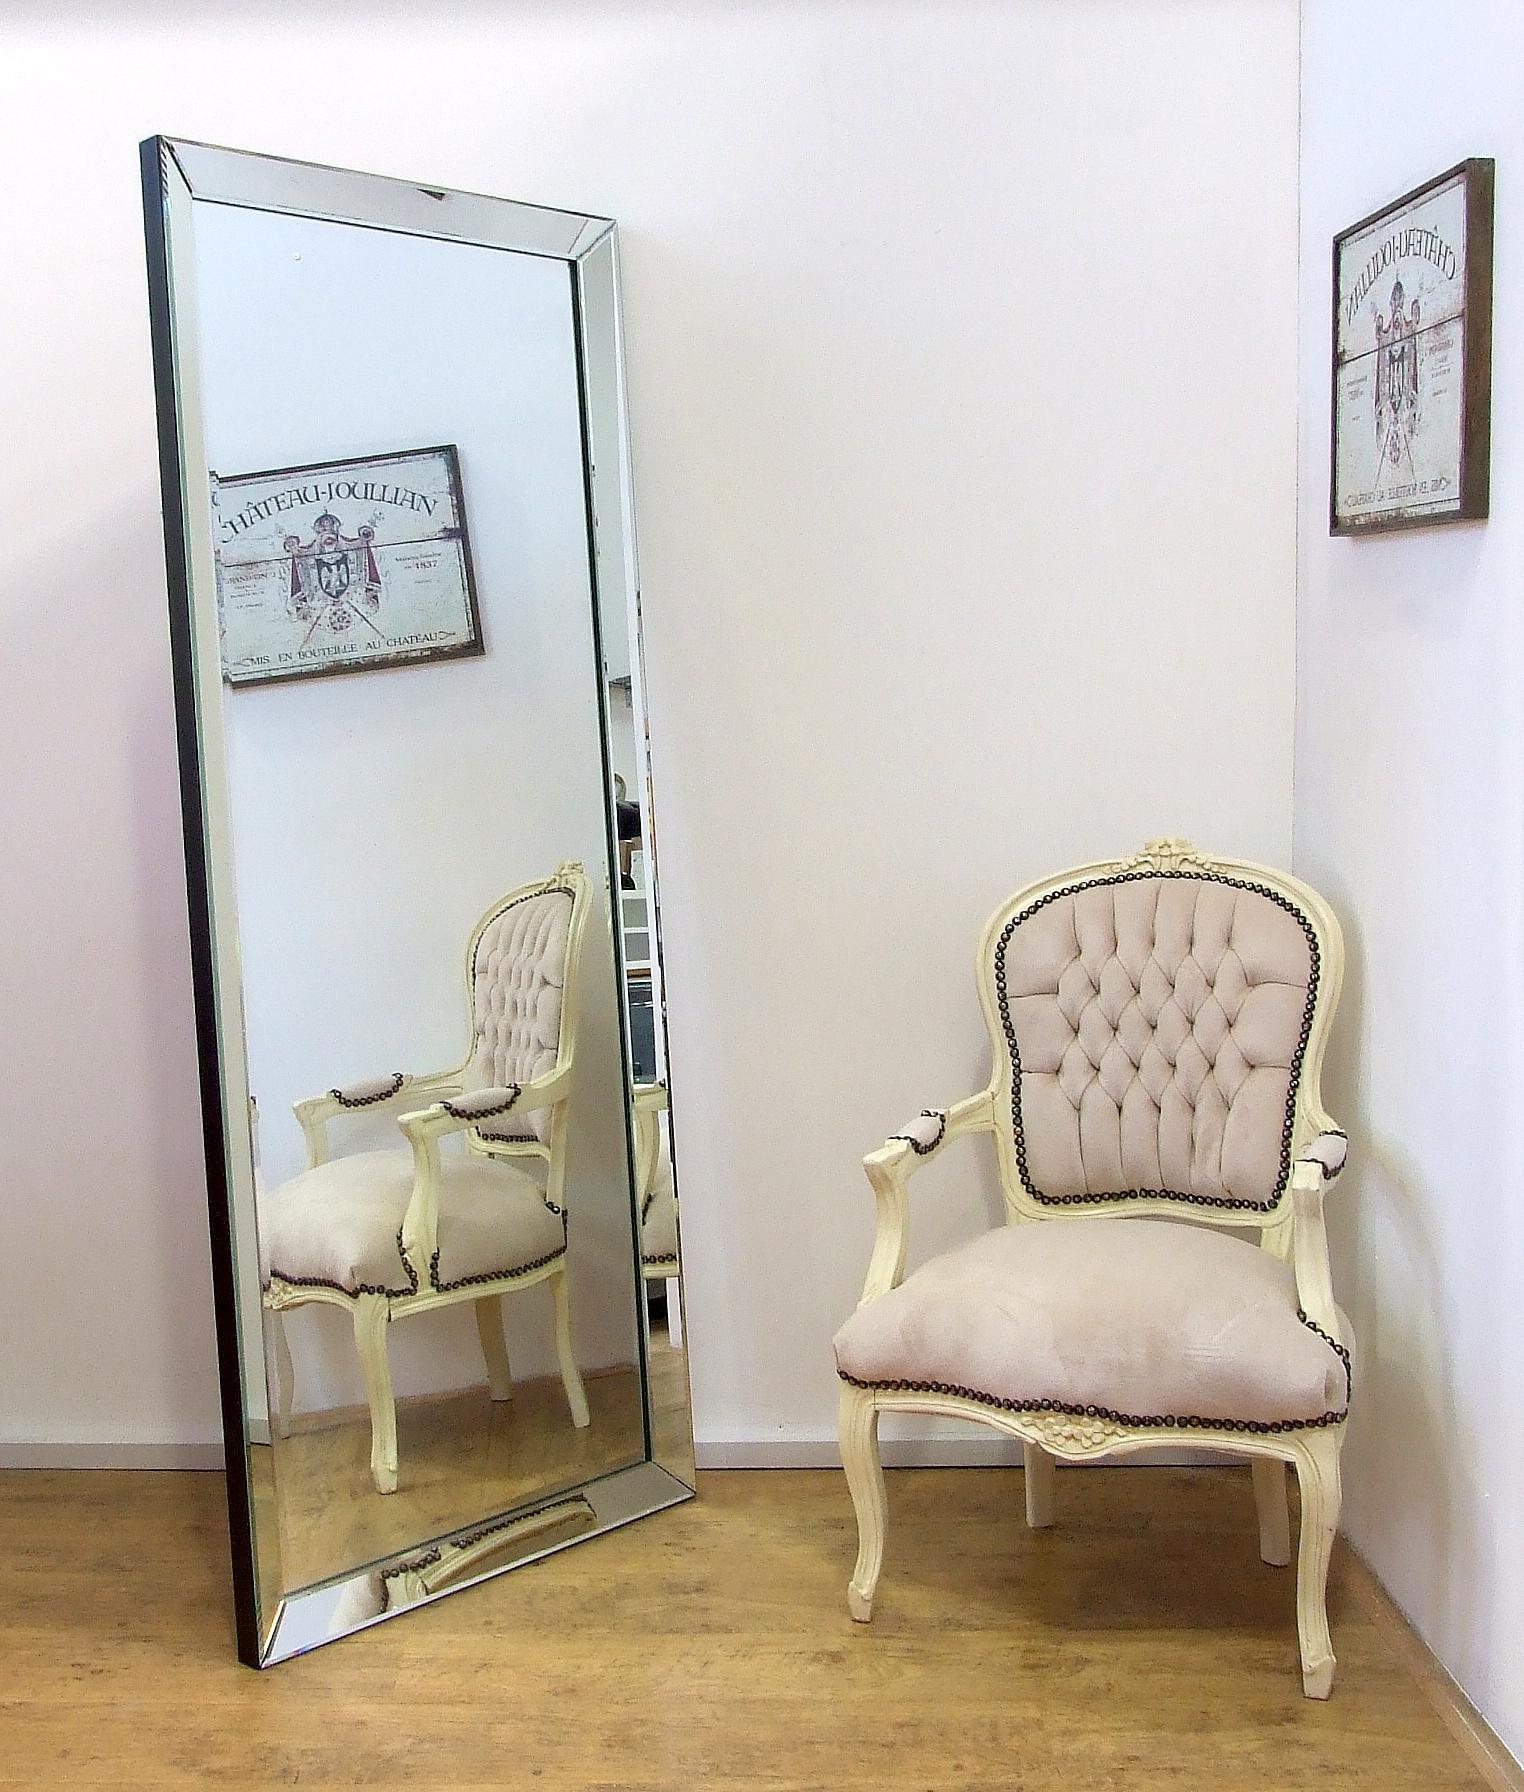 Full Length Frameless Wall Mirrors In Most Up To Date Luna Modern Full Length Xlarge Frameless Wall Leaner Floor Mirror  (View 11 of 20)